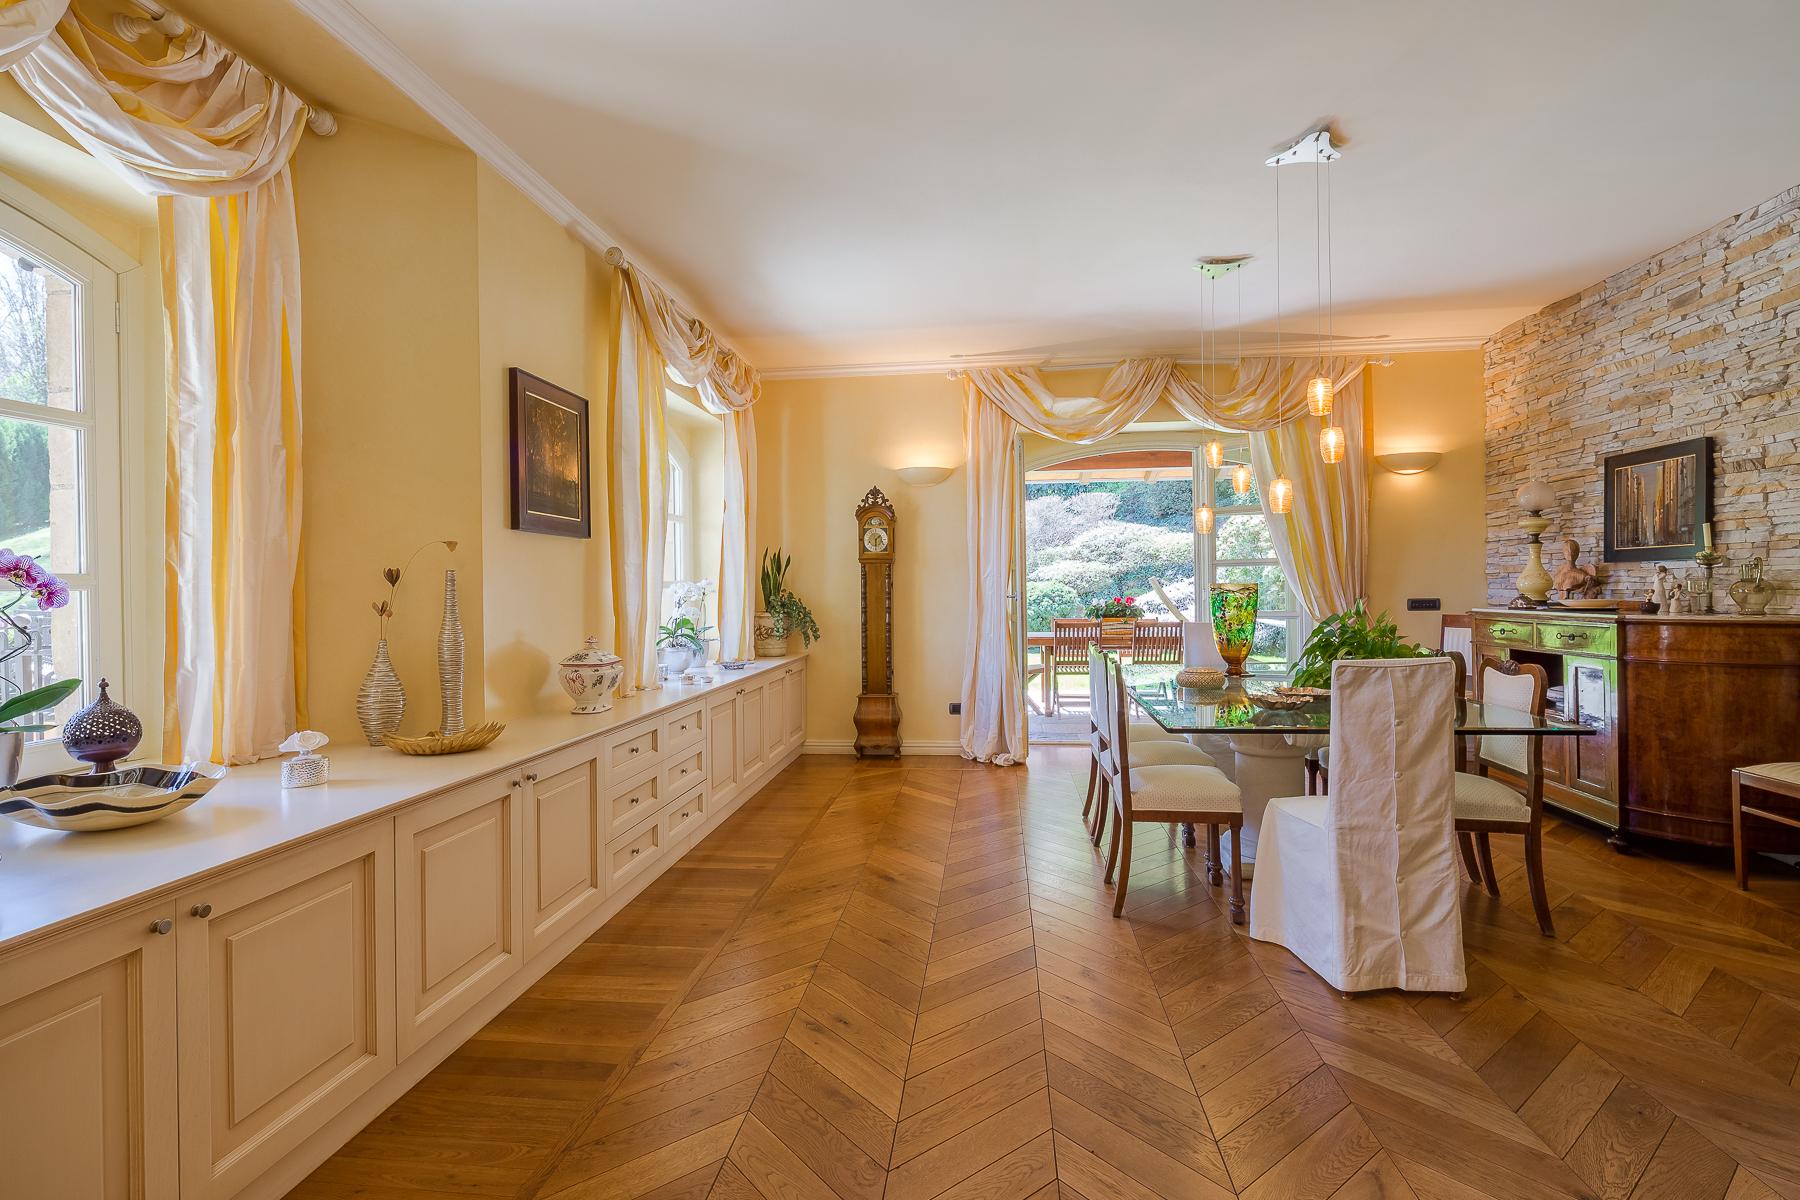 Villa in Vendita a Varese: 5 locali, 470 mq - Foto 13